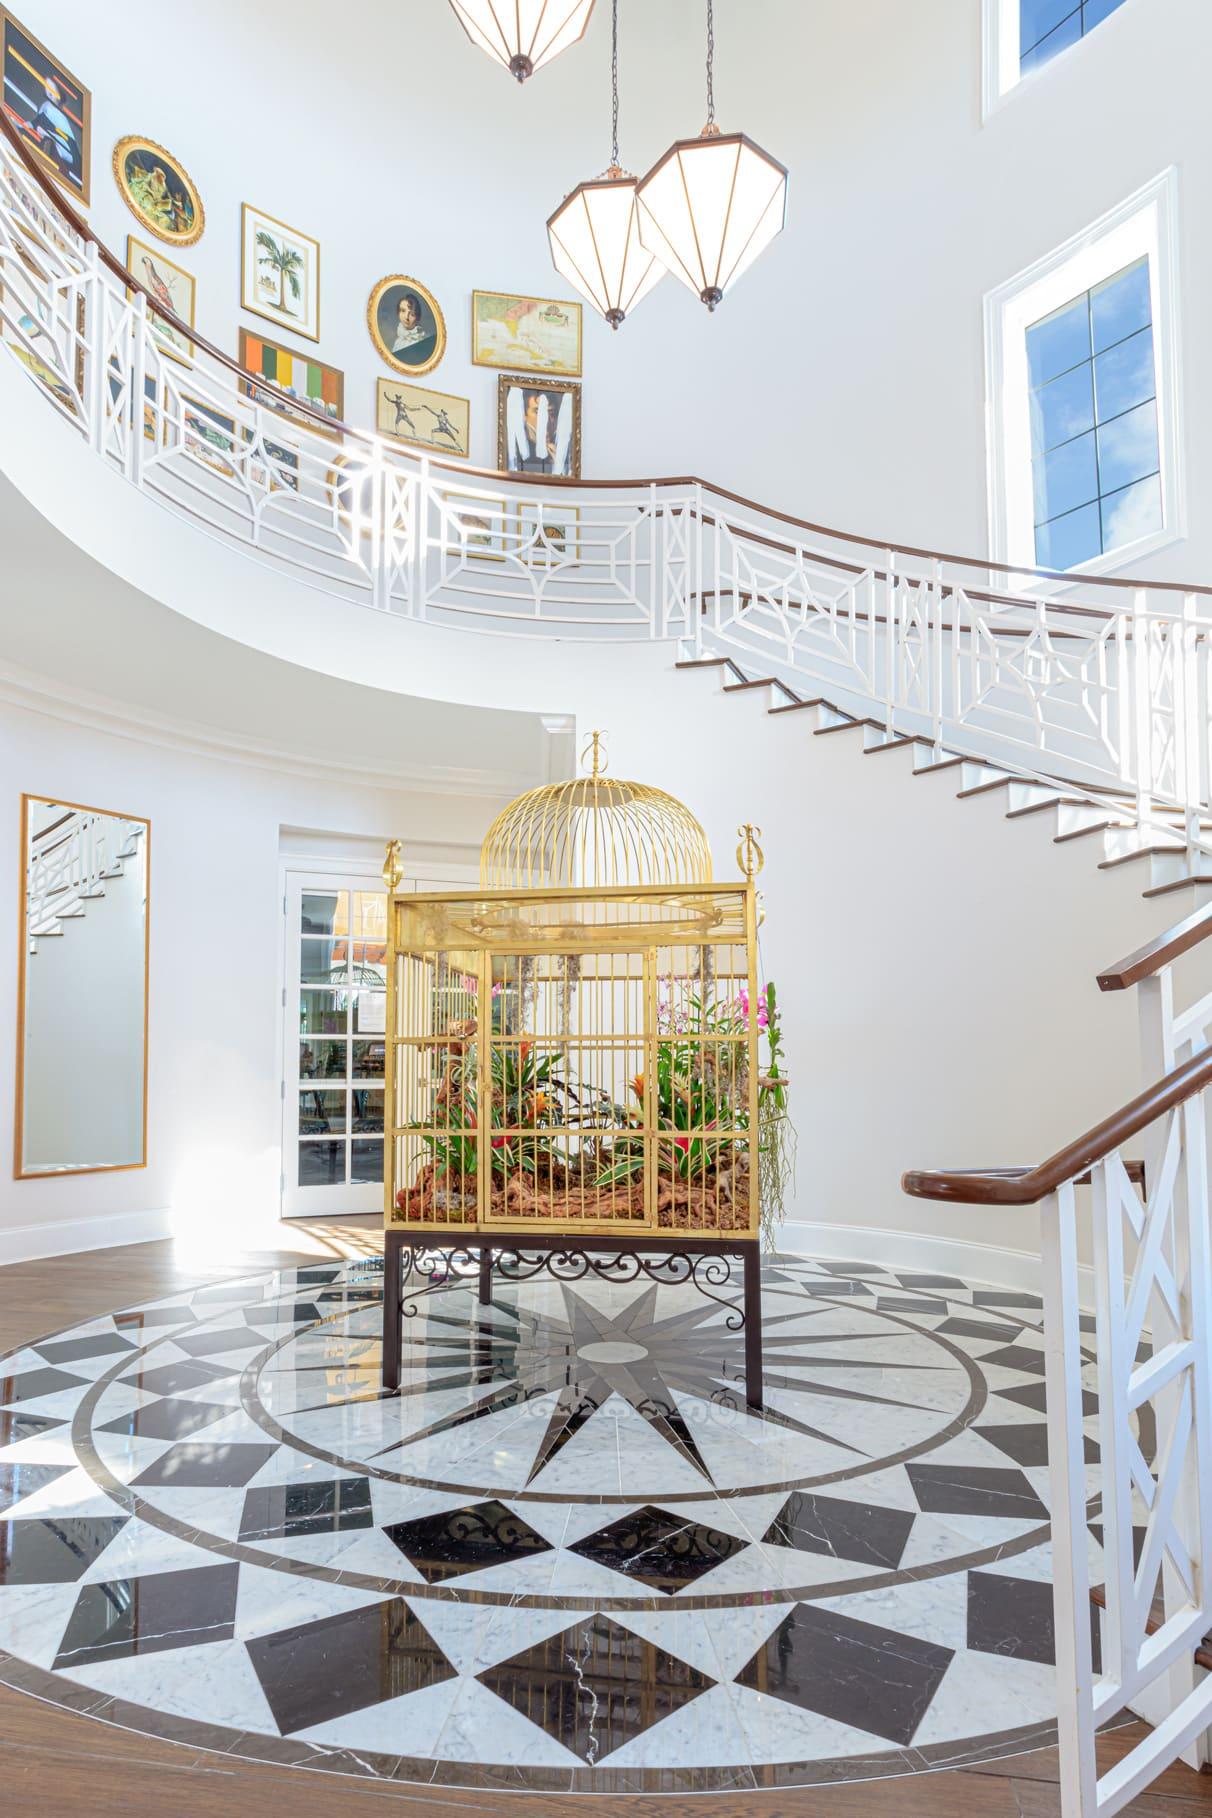 Water Tower Commons Ph I | Interior Area 6 | Lantana, FL | Multifamily | Interior Designers